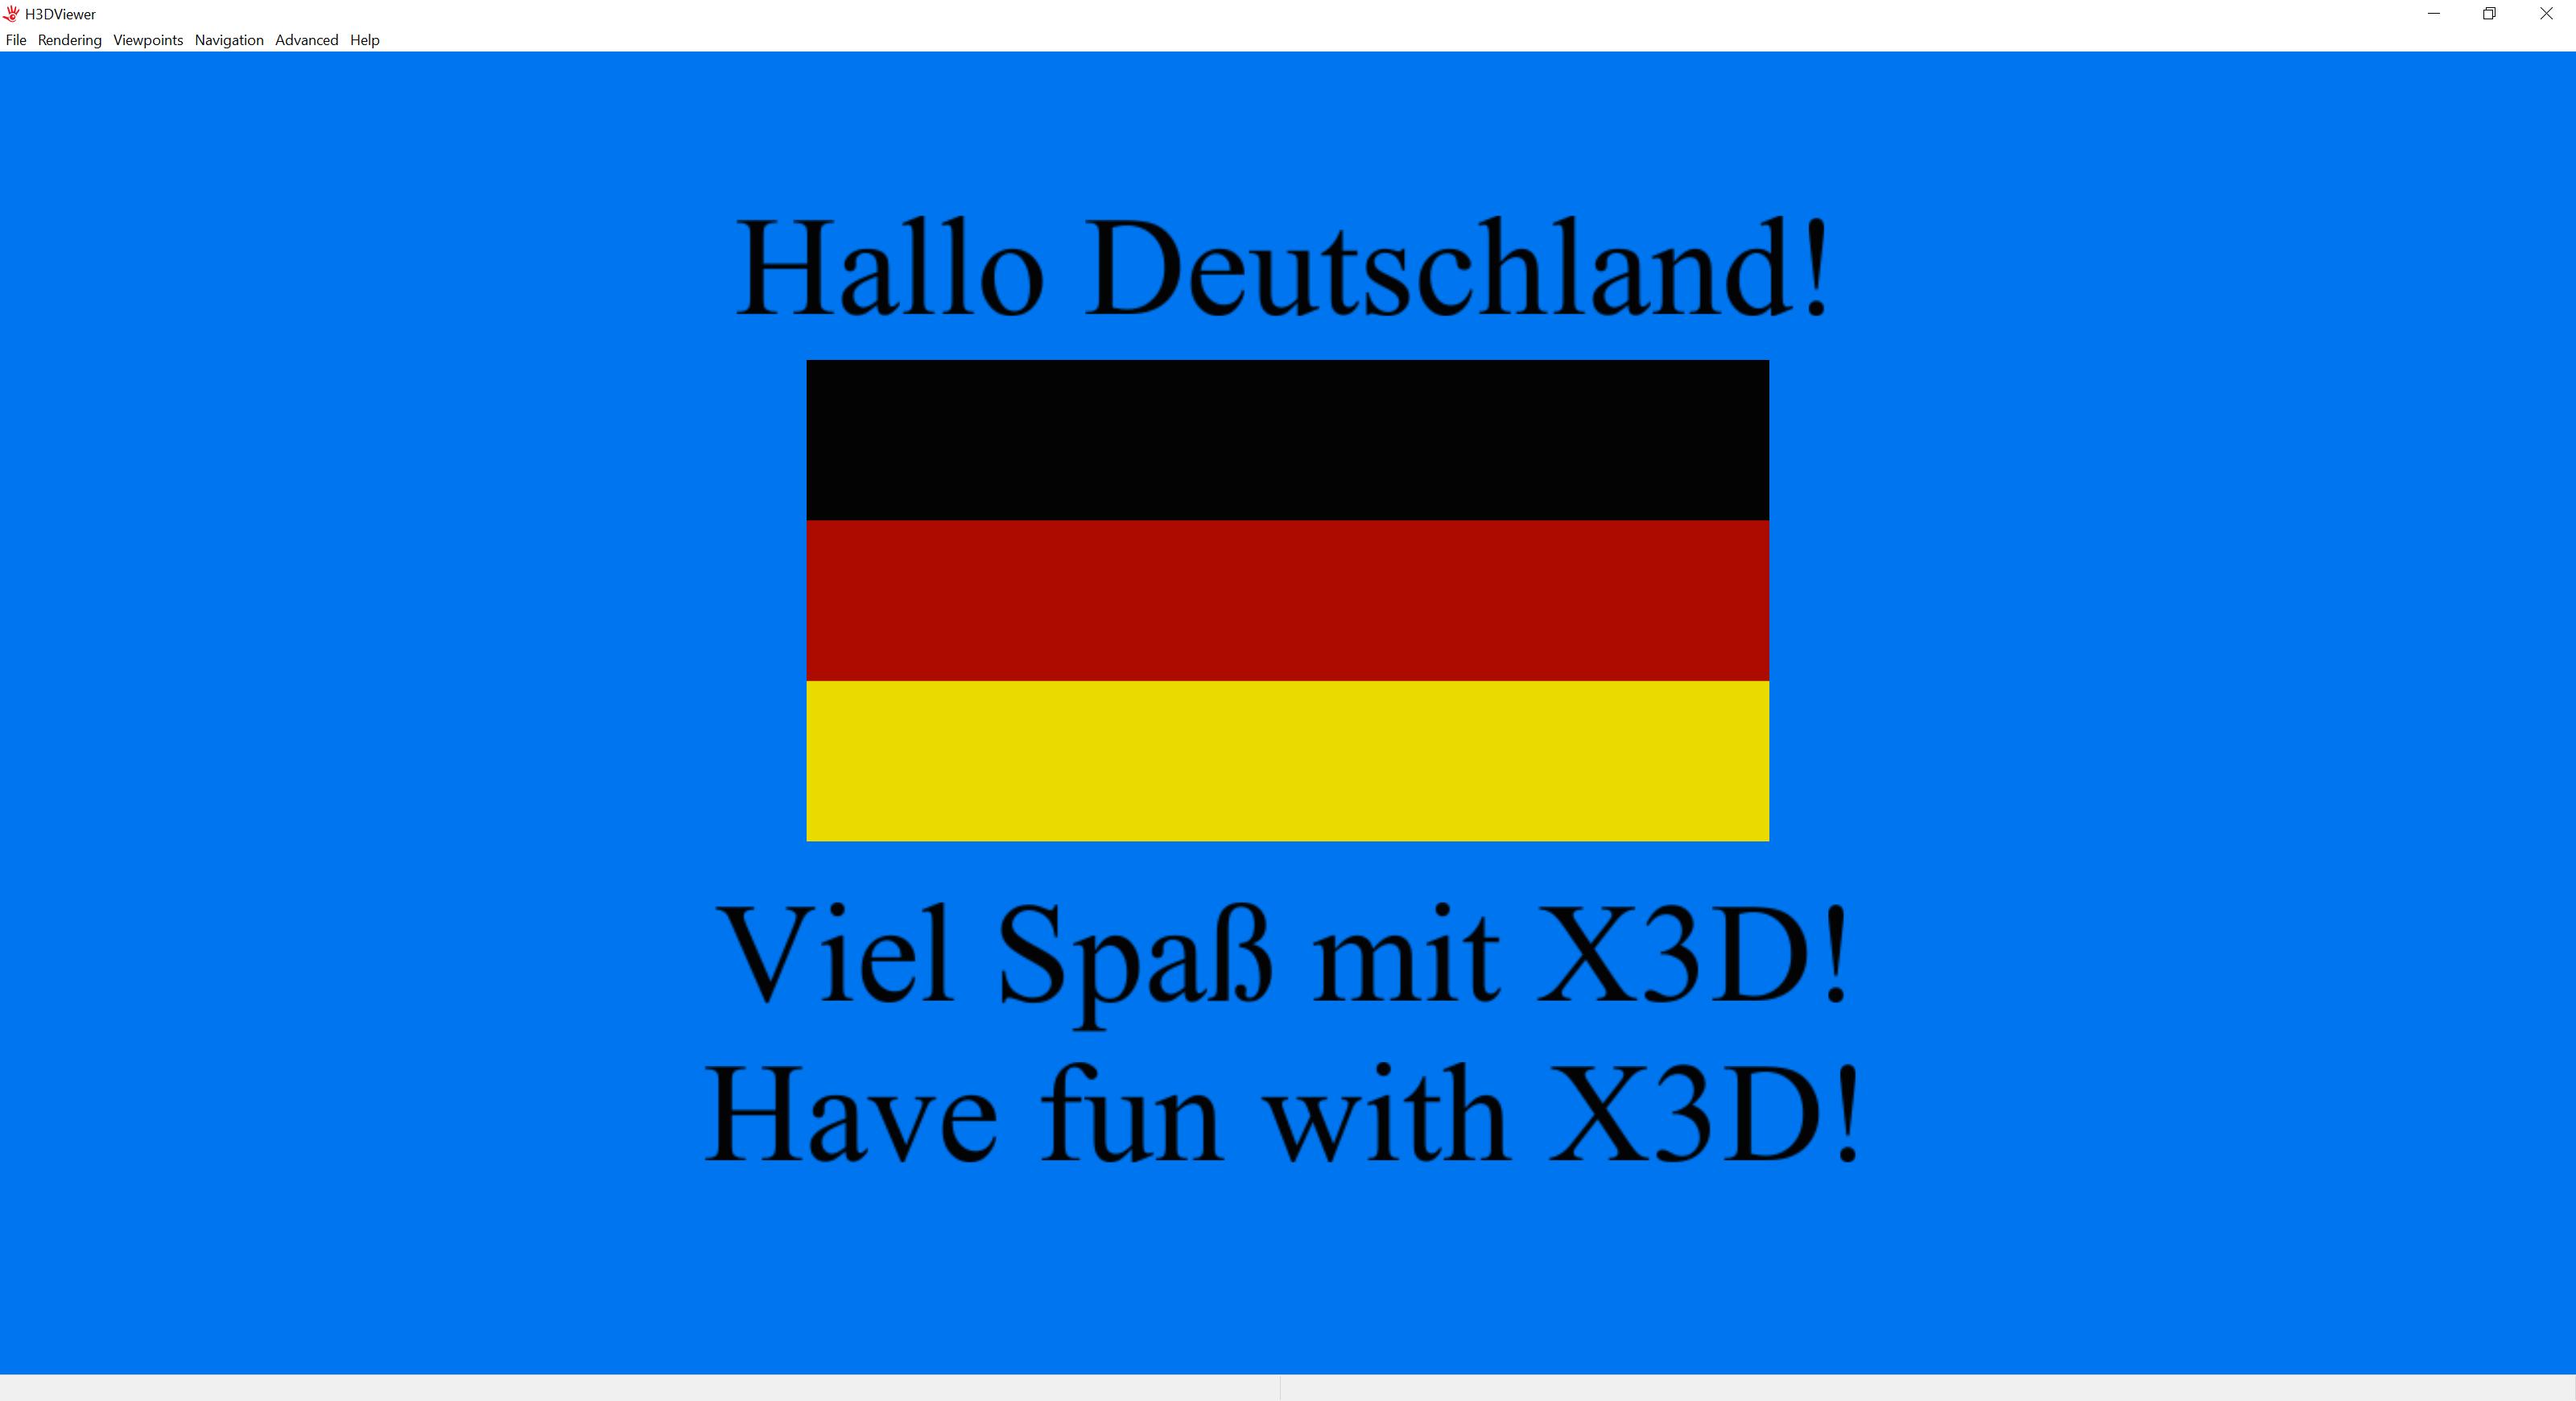 BrennenstuhlTobias/Screenshots/Player/Hello Germany/HelloGermany.H3DViewer.png